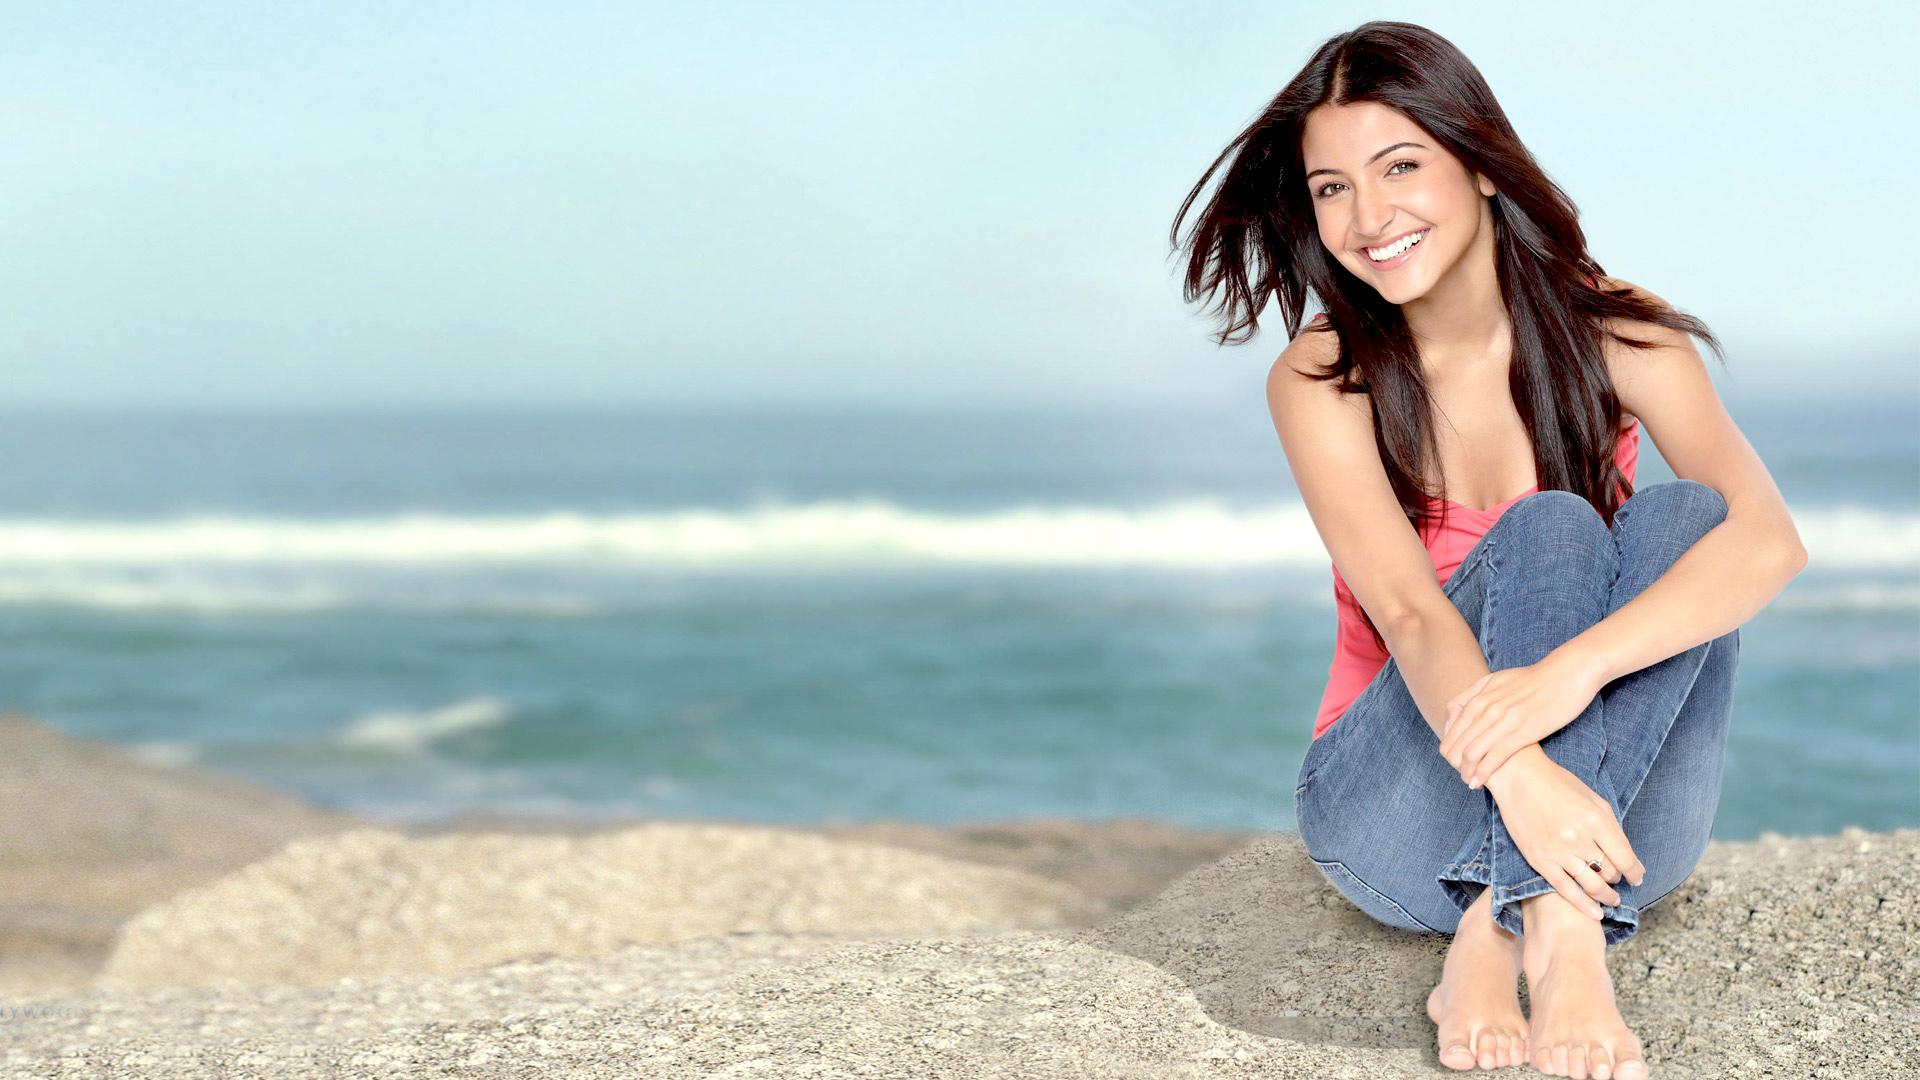 actress_anushka_sharma-HD